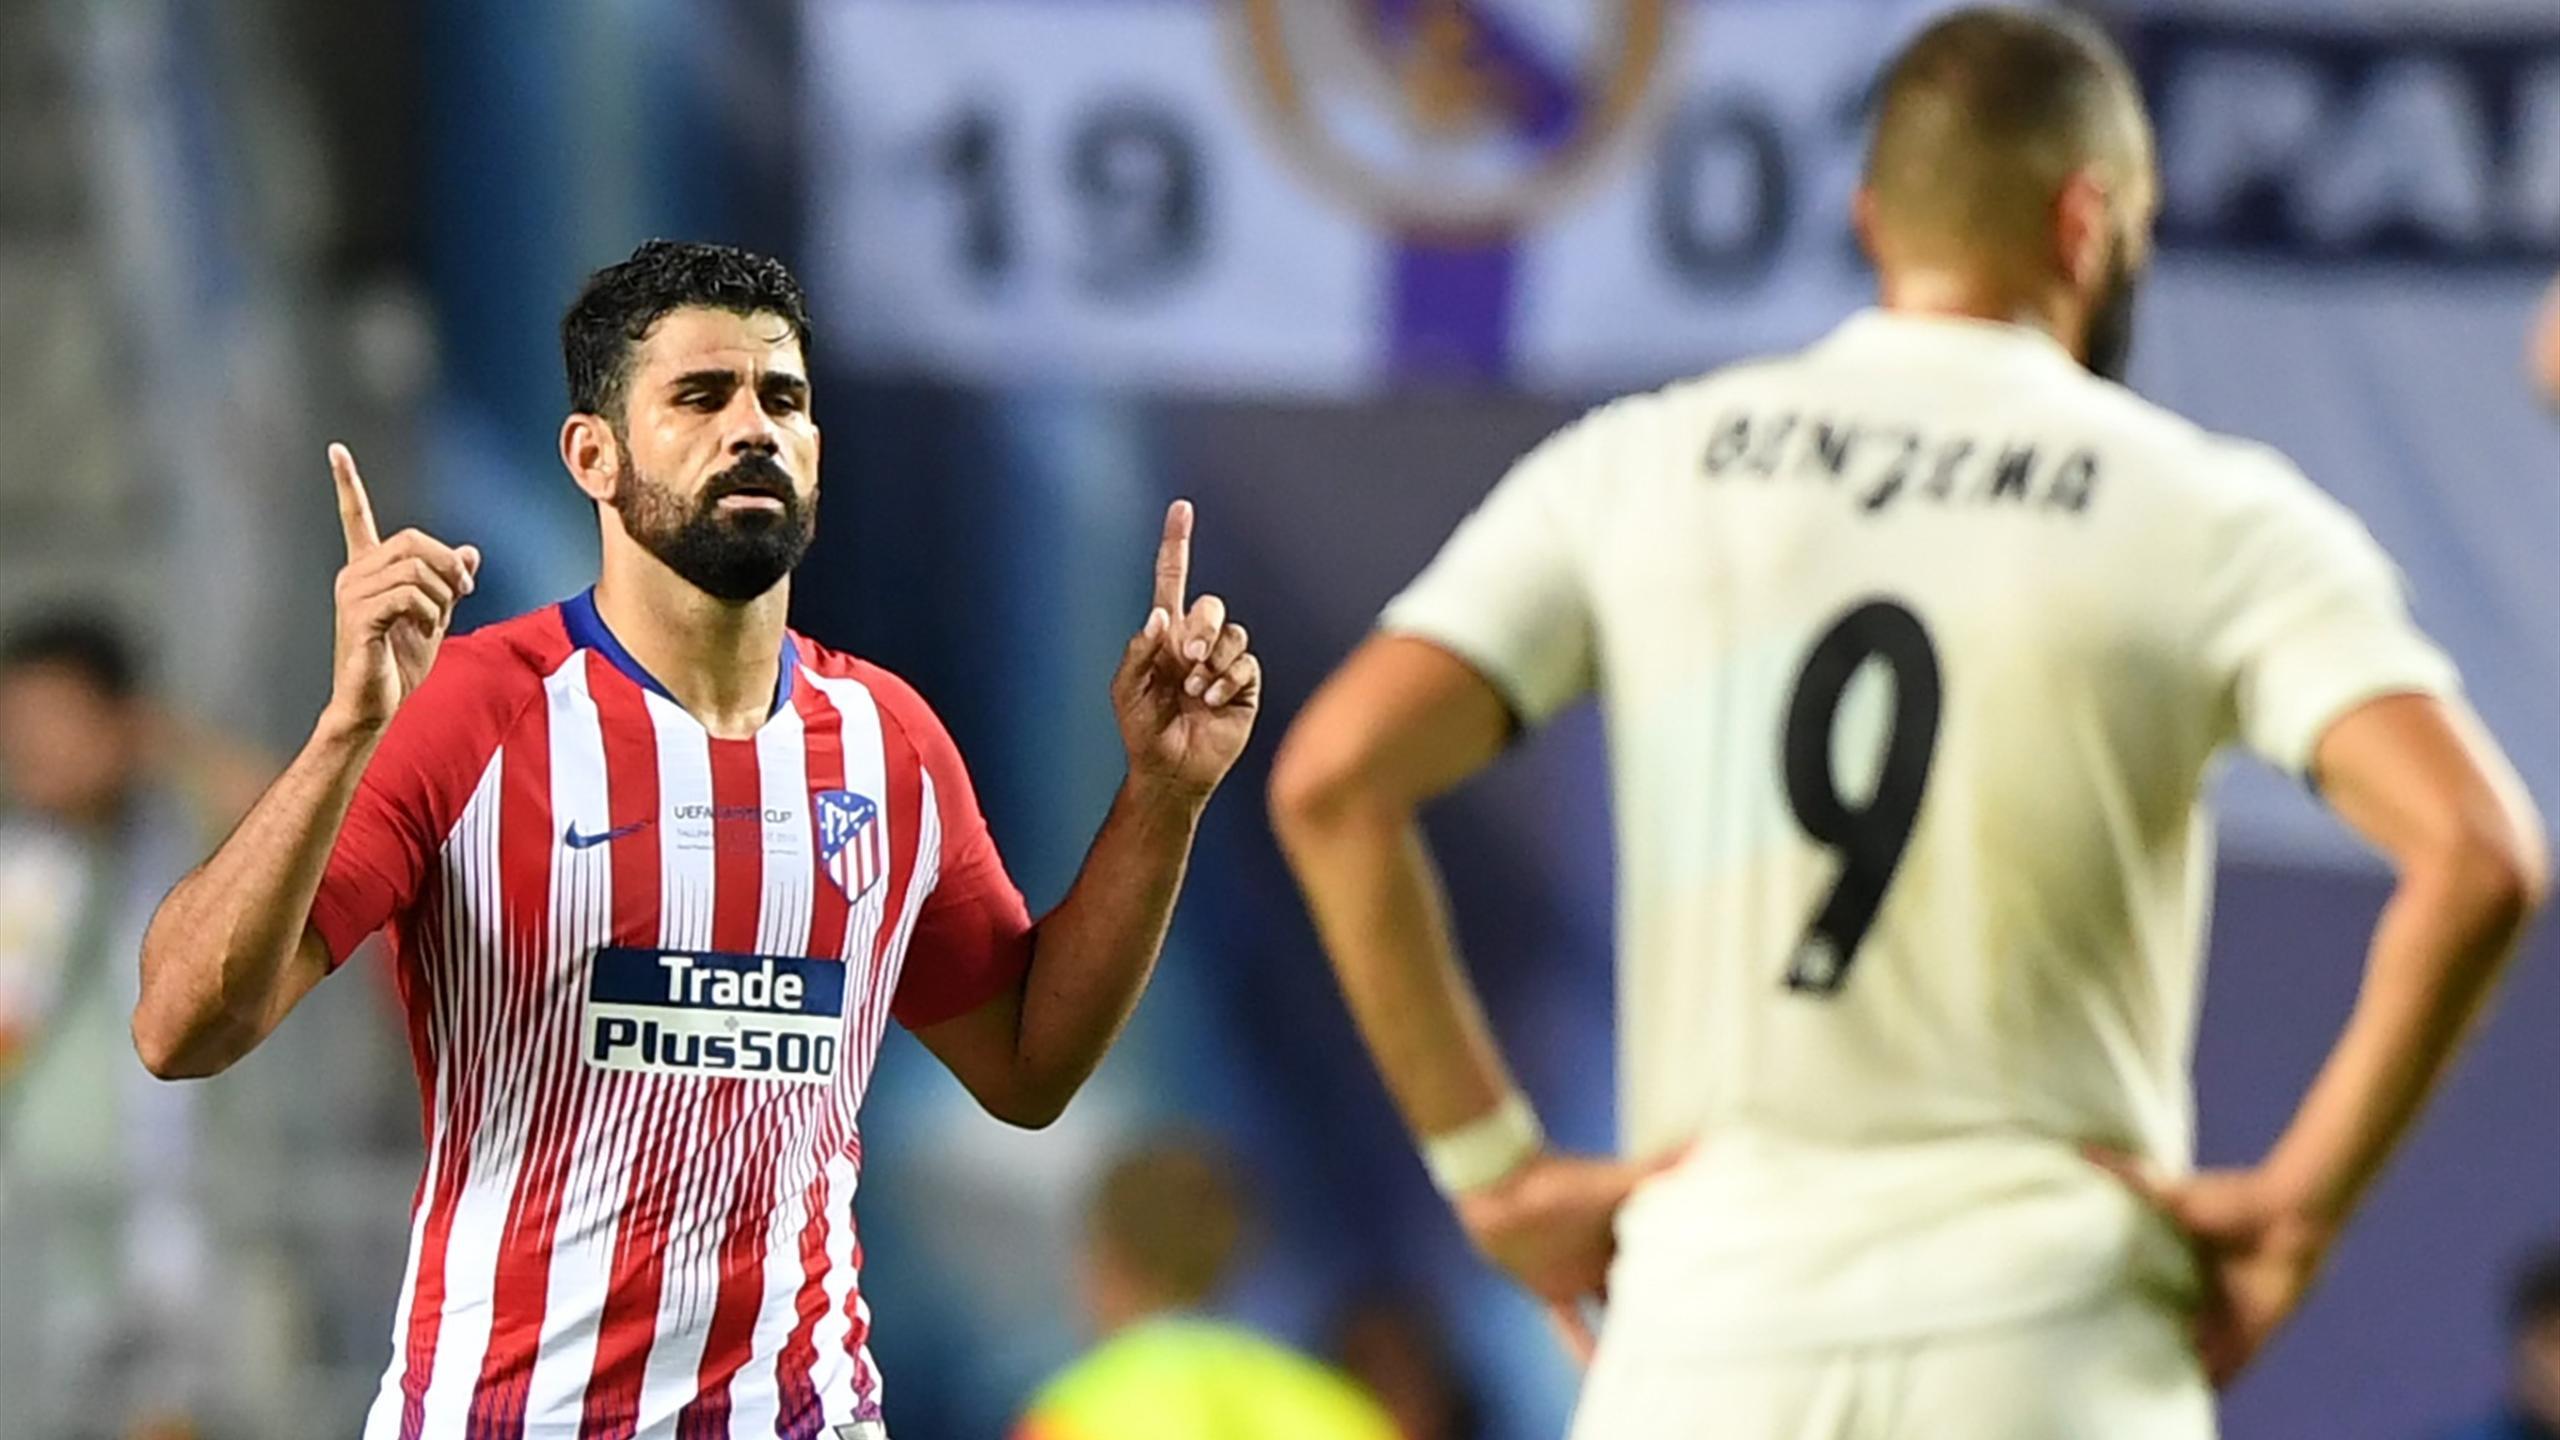 Terza Maglia Atlético de Madrid Rodrigo